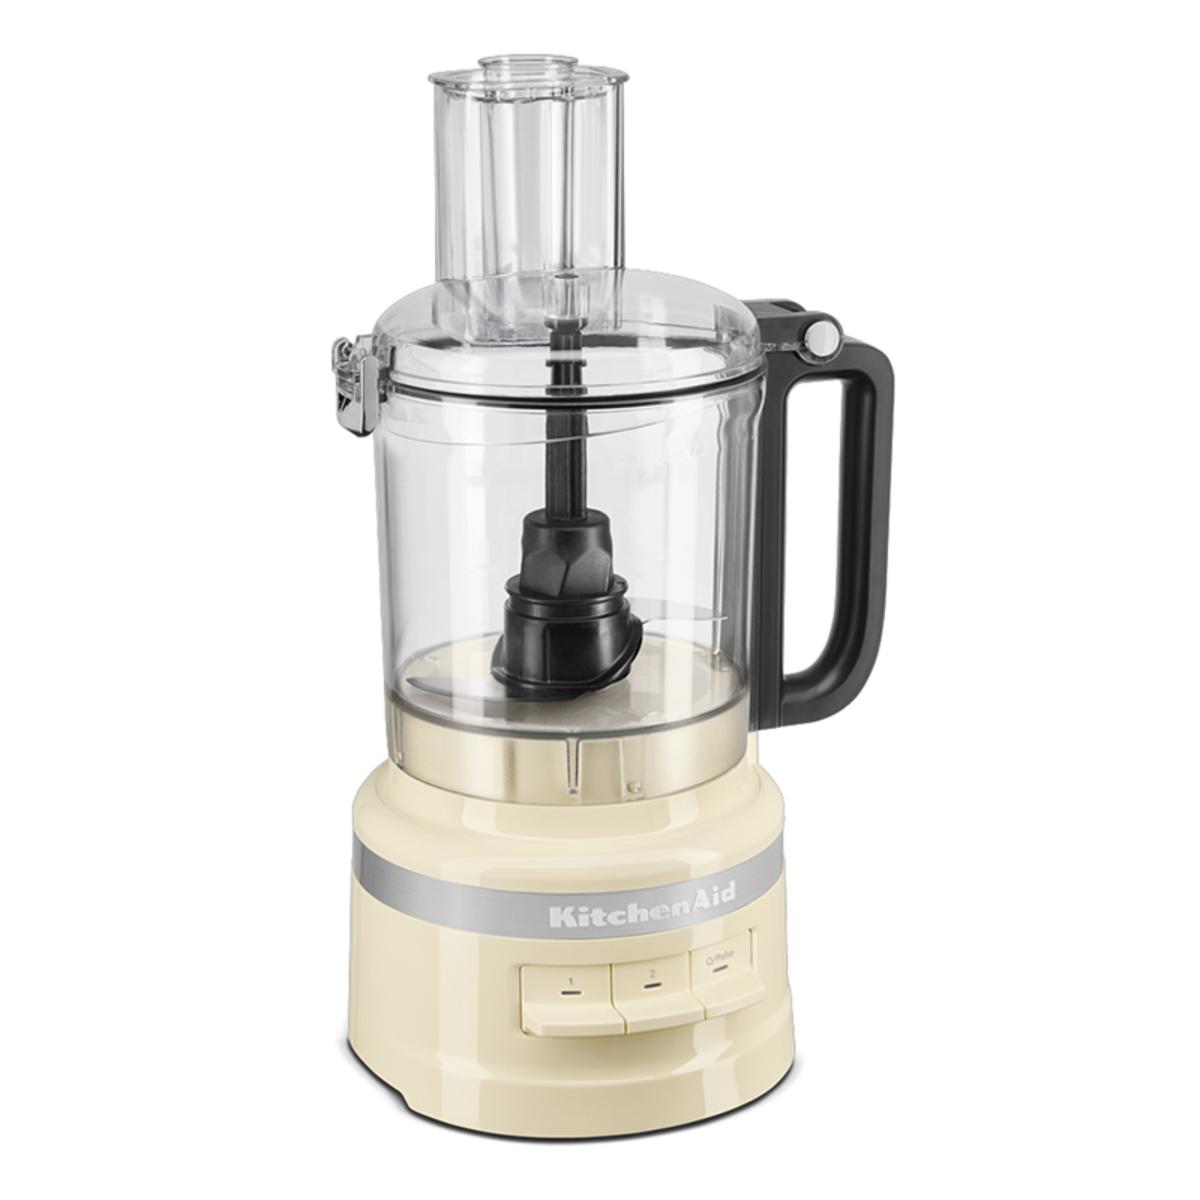 Image of KitchenAid 5KFP0919BAC 2.1L Food Processor, Almond Cream